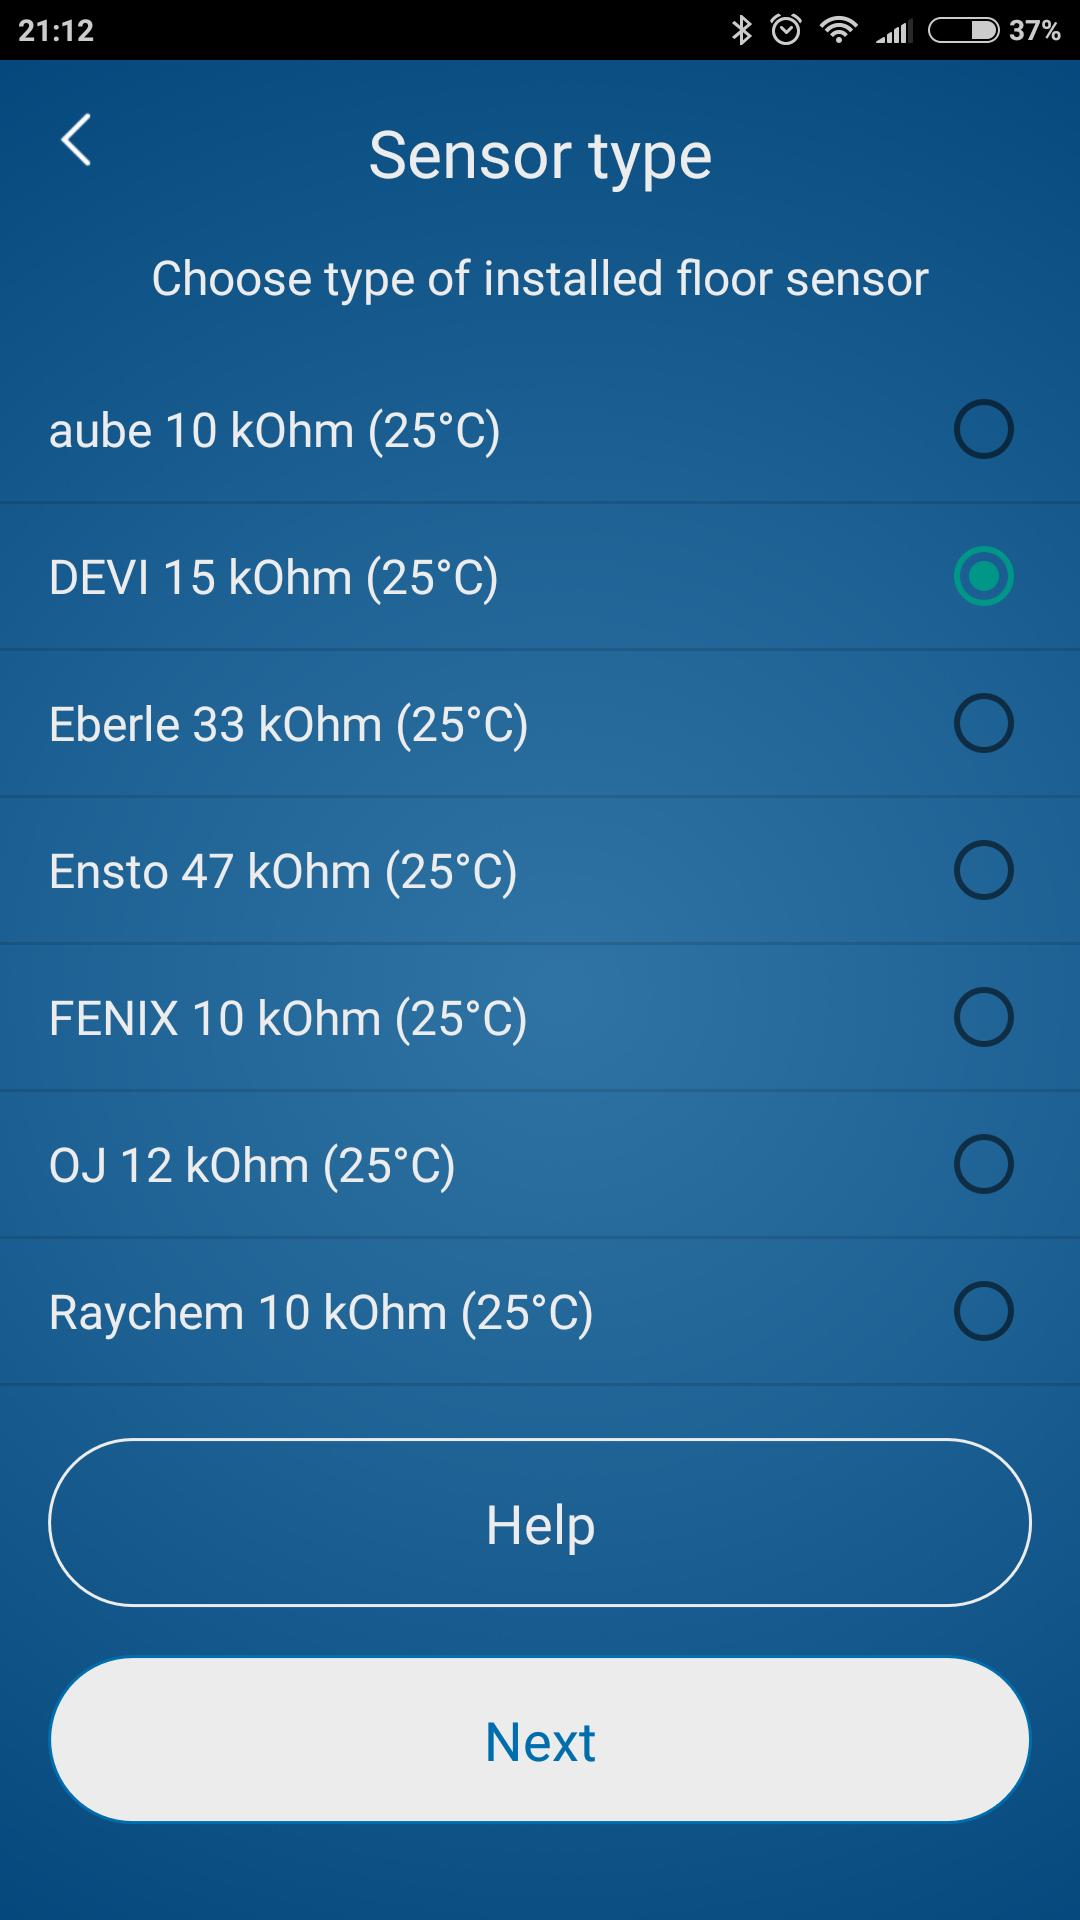 screenshot 2016 11 30 21 12 46 265 com danfoss devi smartapp h vard siegel haukeberg. Black Bedroom Furniture Sets. Home Design Ideas